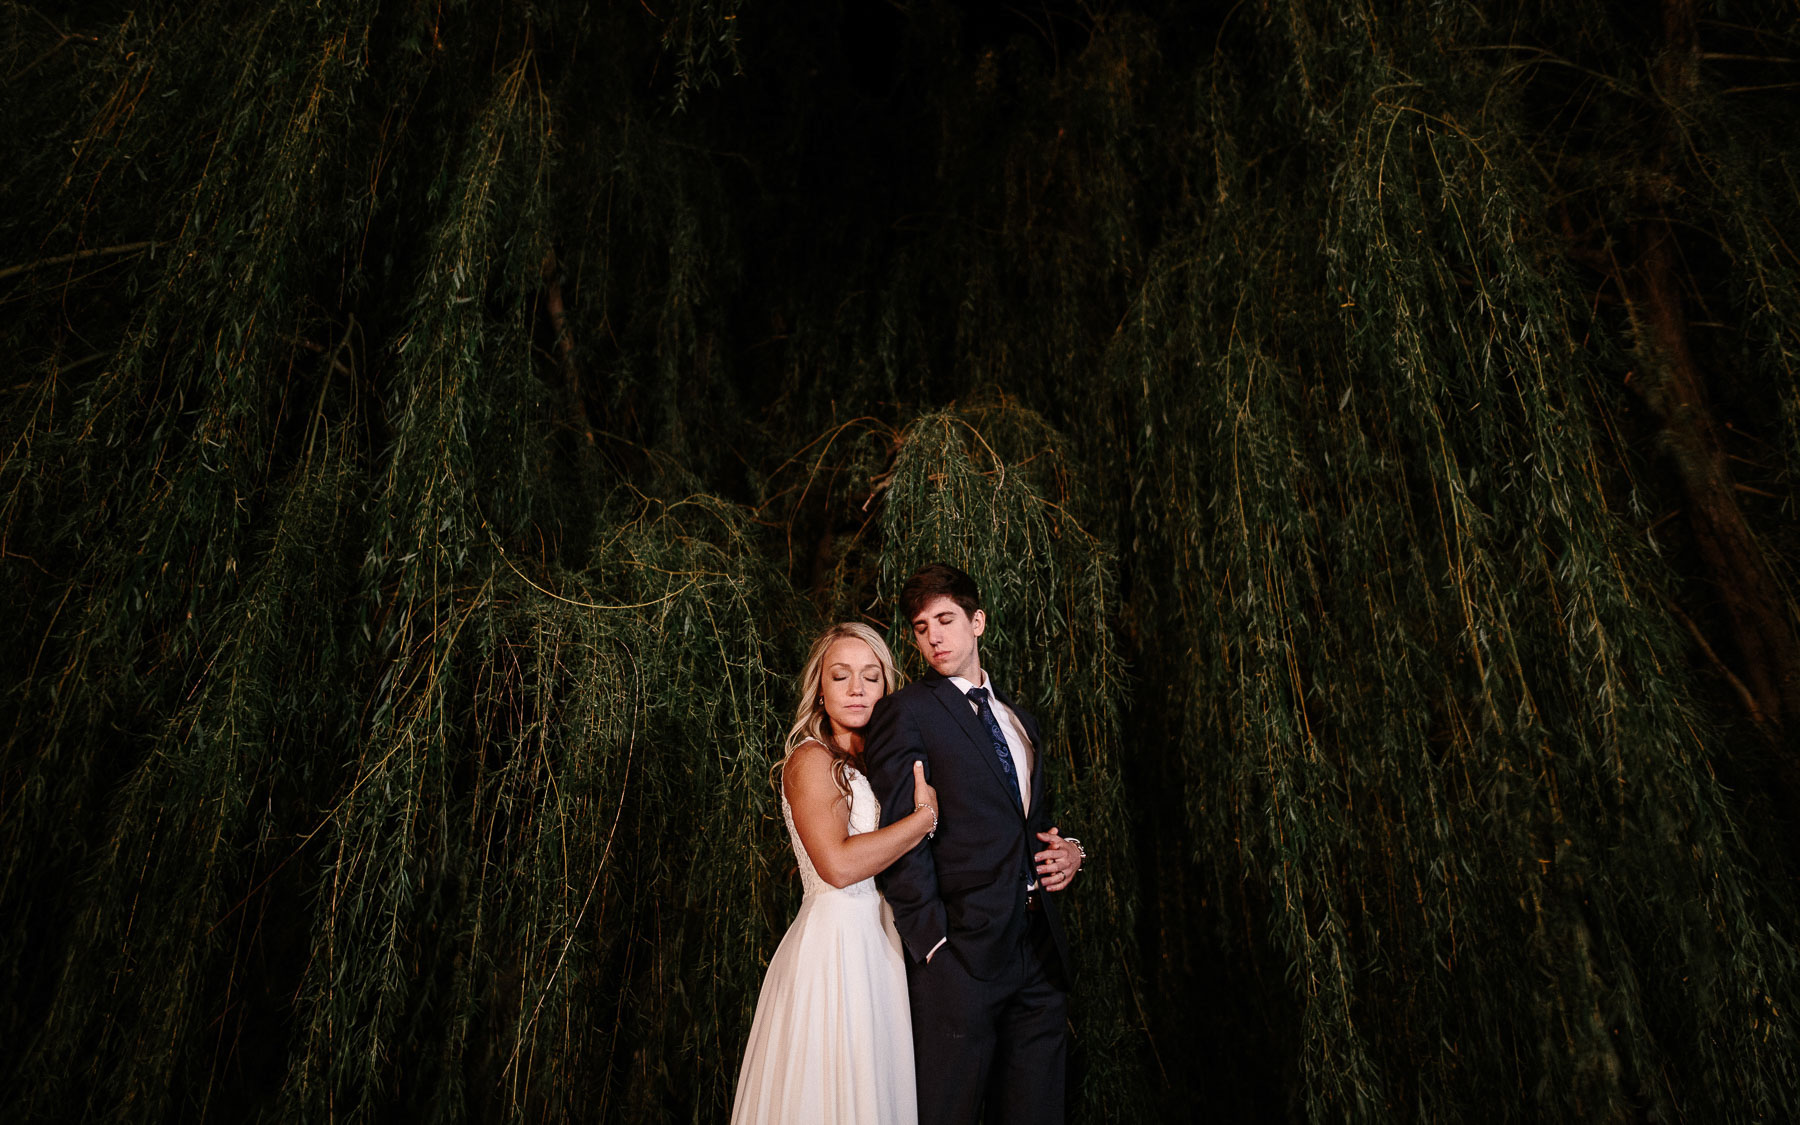 Intimate_Farmhouse_SD_Wedding_Bridgette_Philip_085.jpg